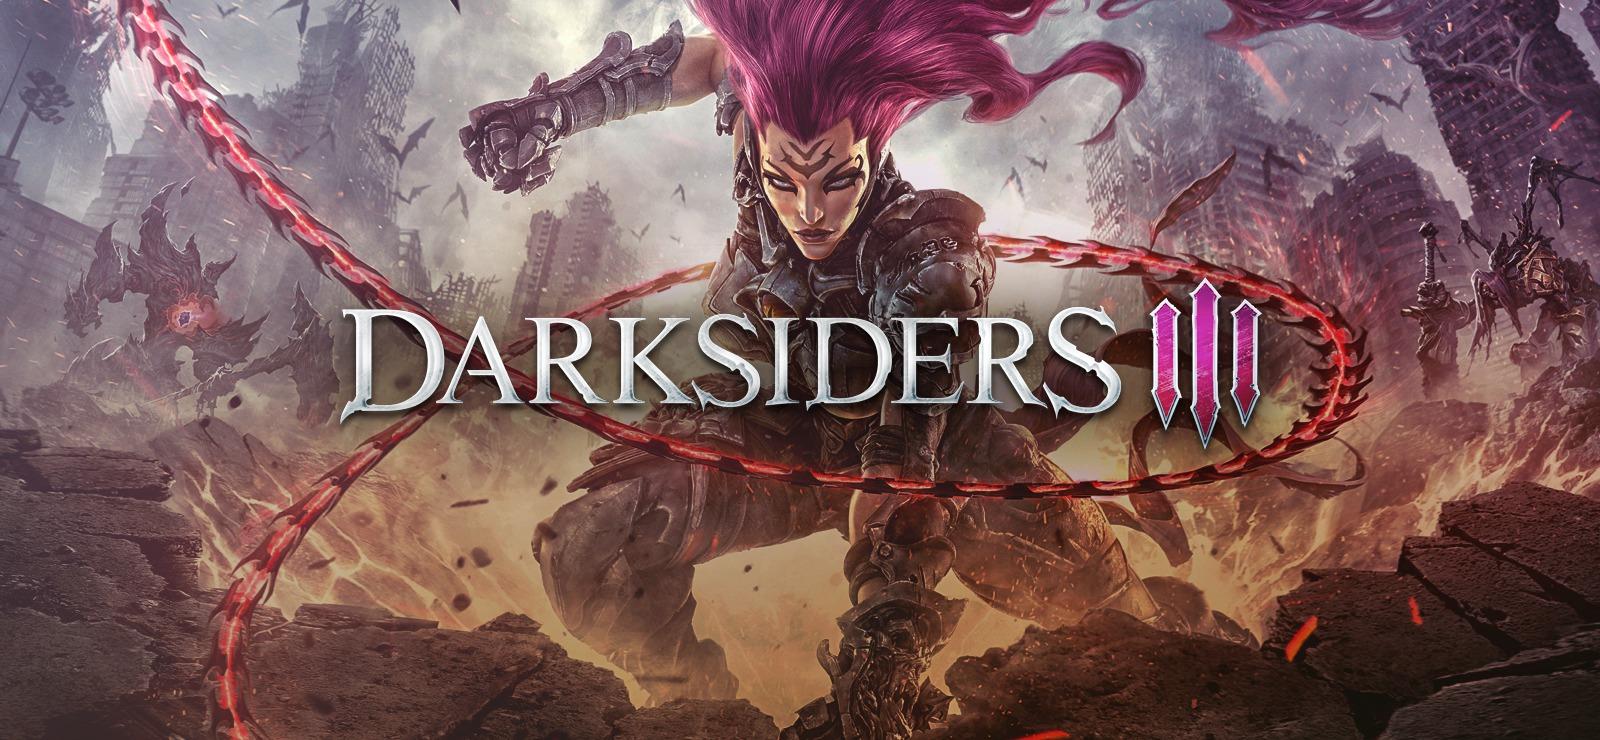 Revisão de Darksiders III - Angry Souls